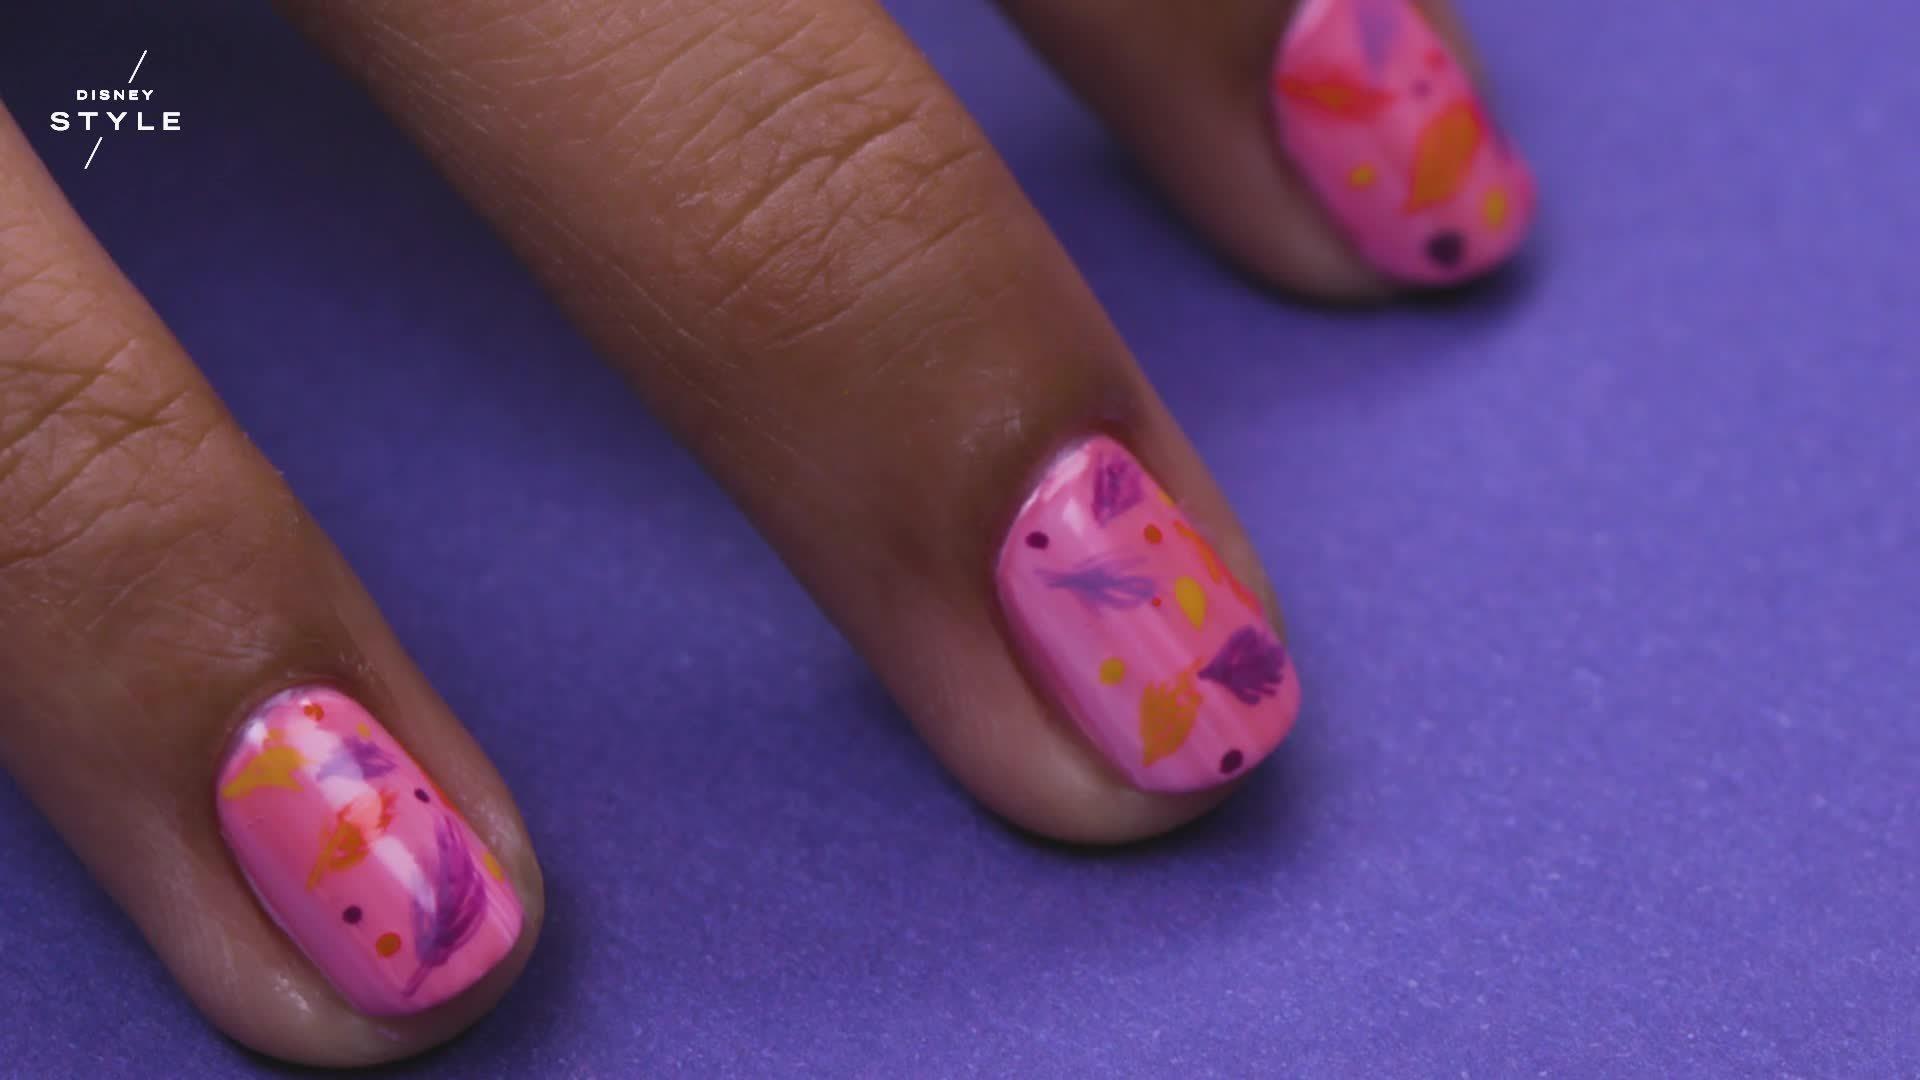 Pocahontas Nail Art | TIPS by Disney Style